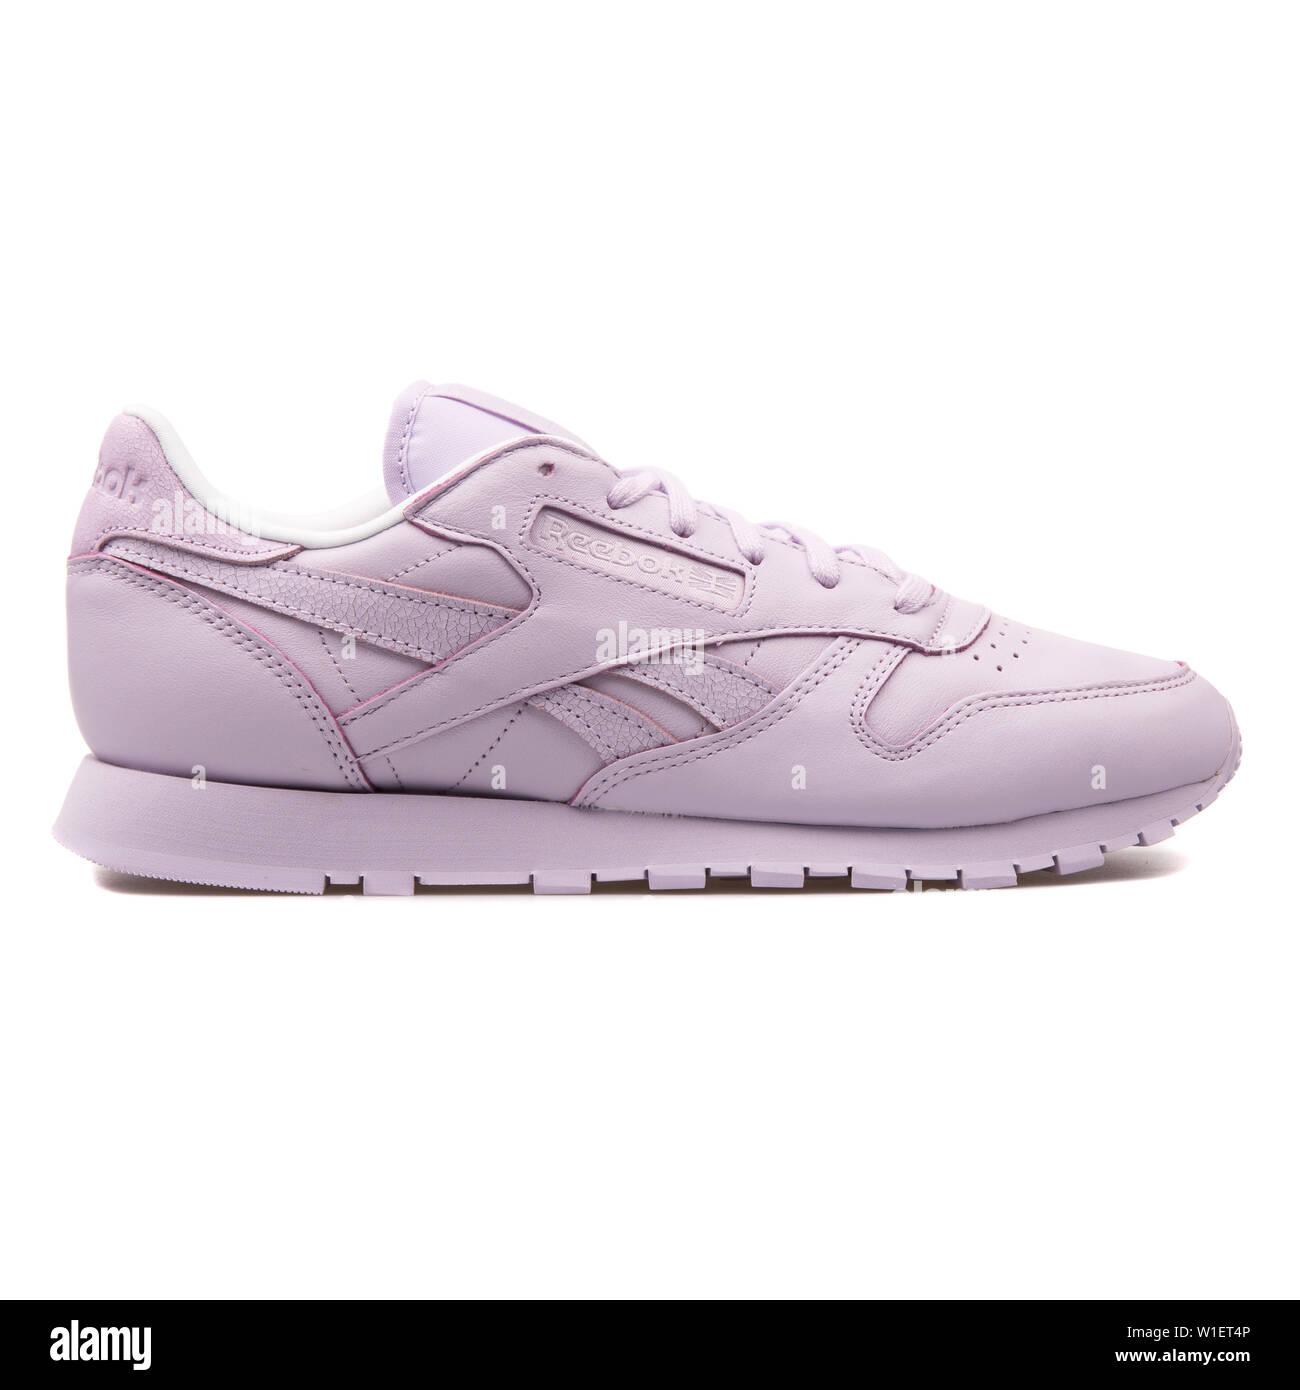 Reebok Samy Deluxe One shoes whitemetallic